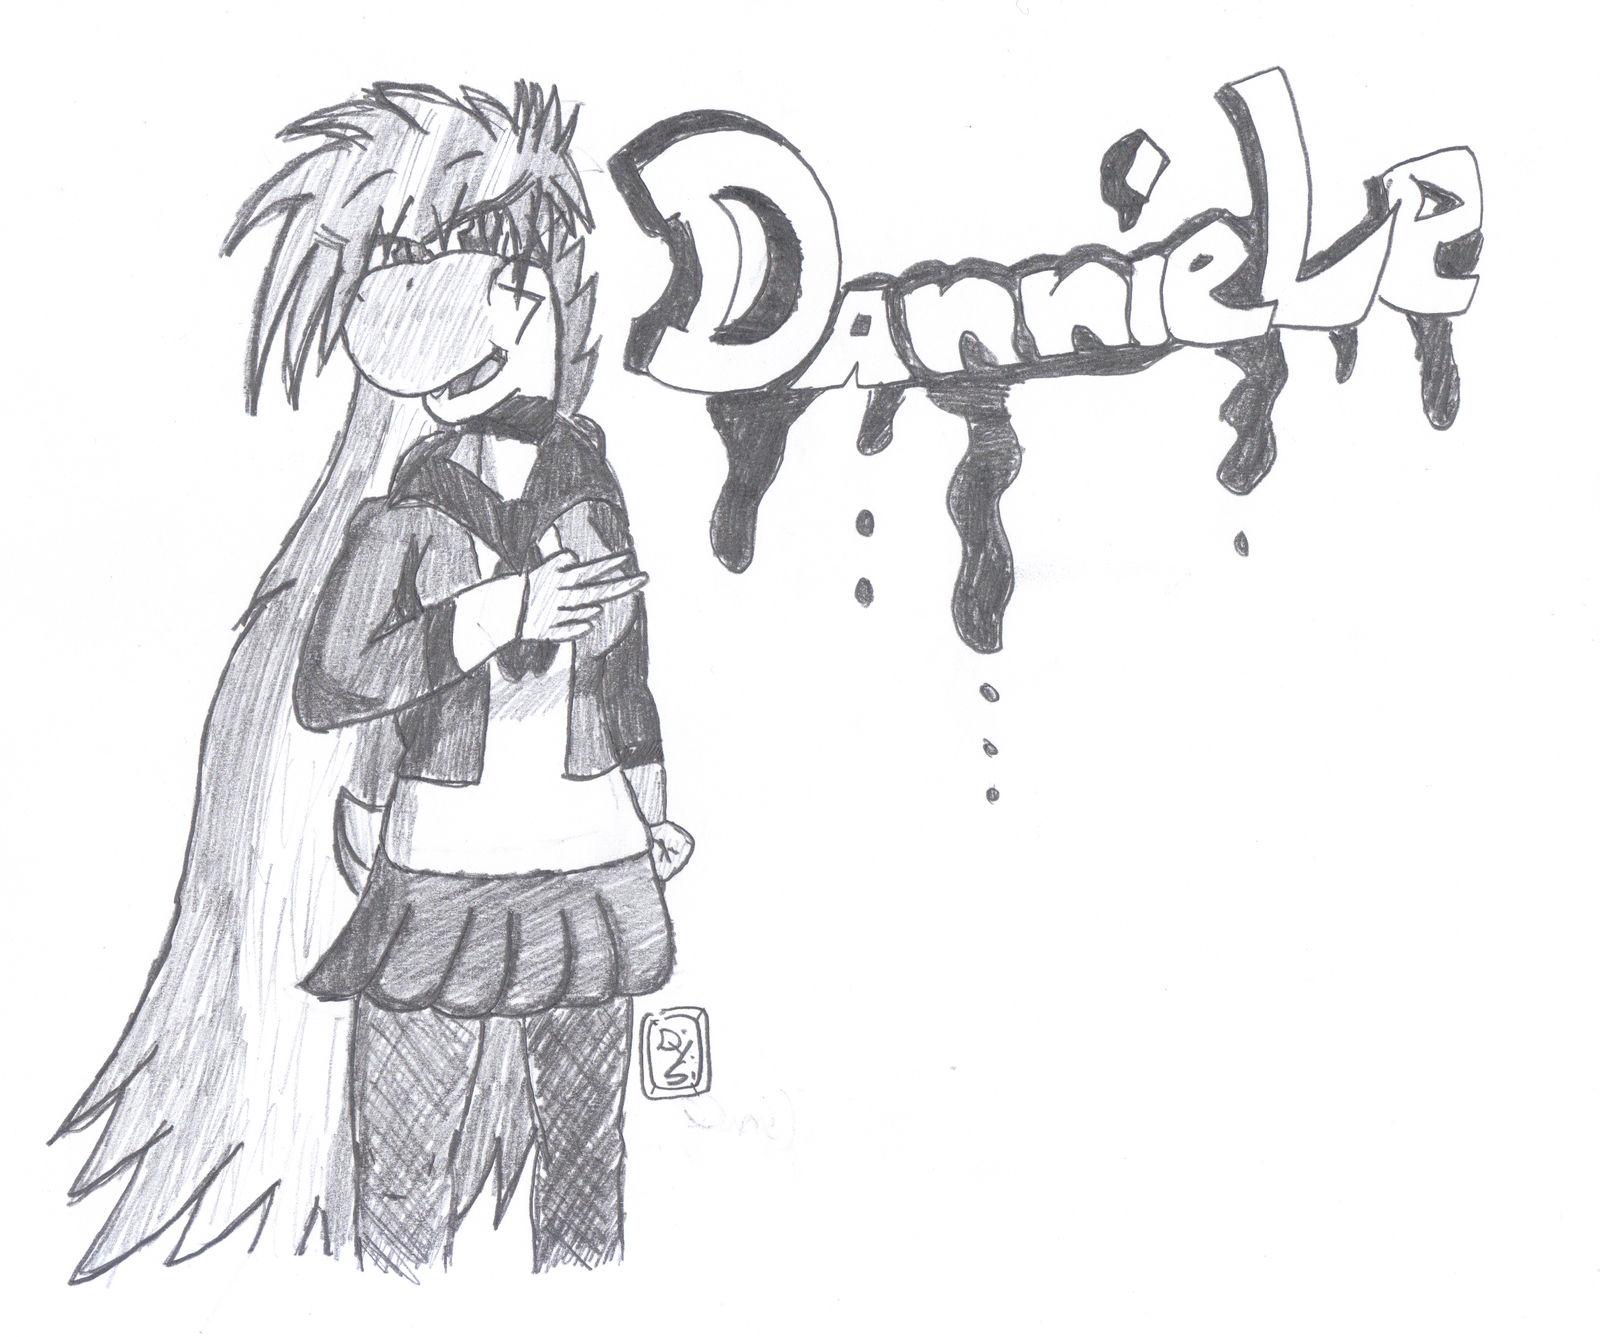 Danniele The Yoshi